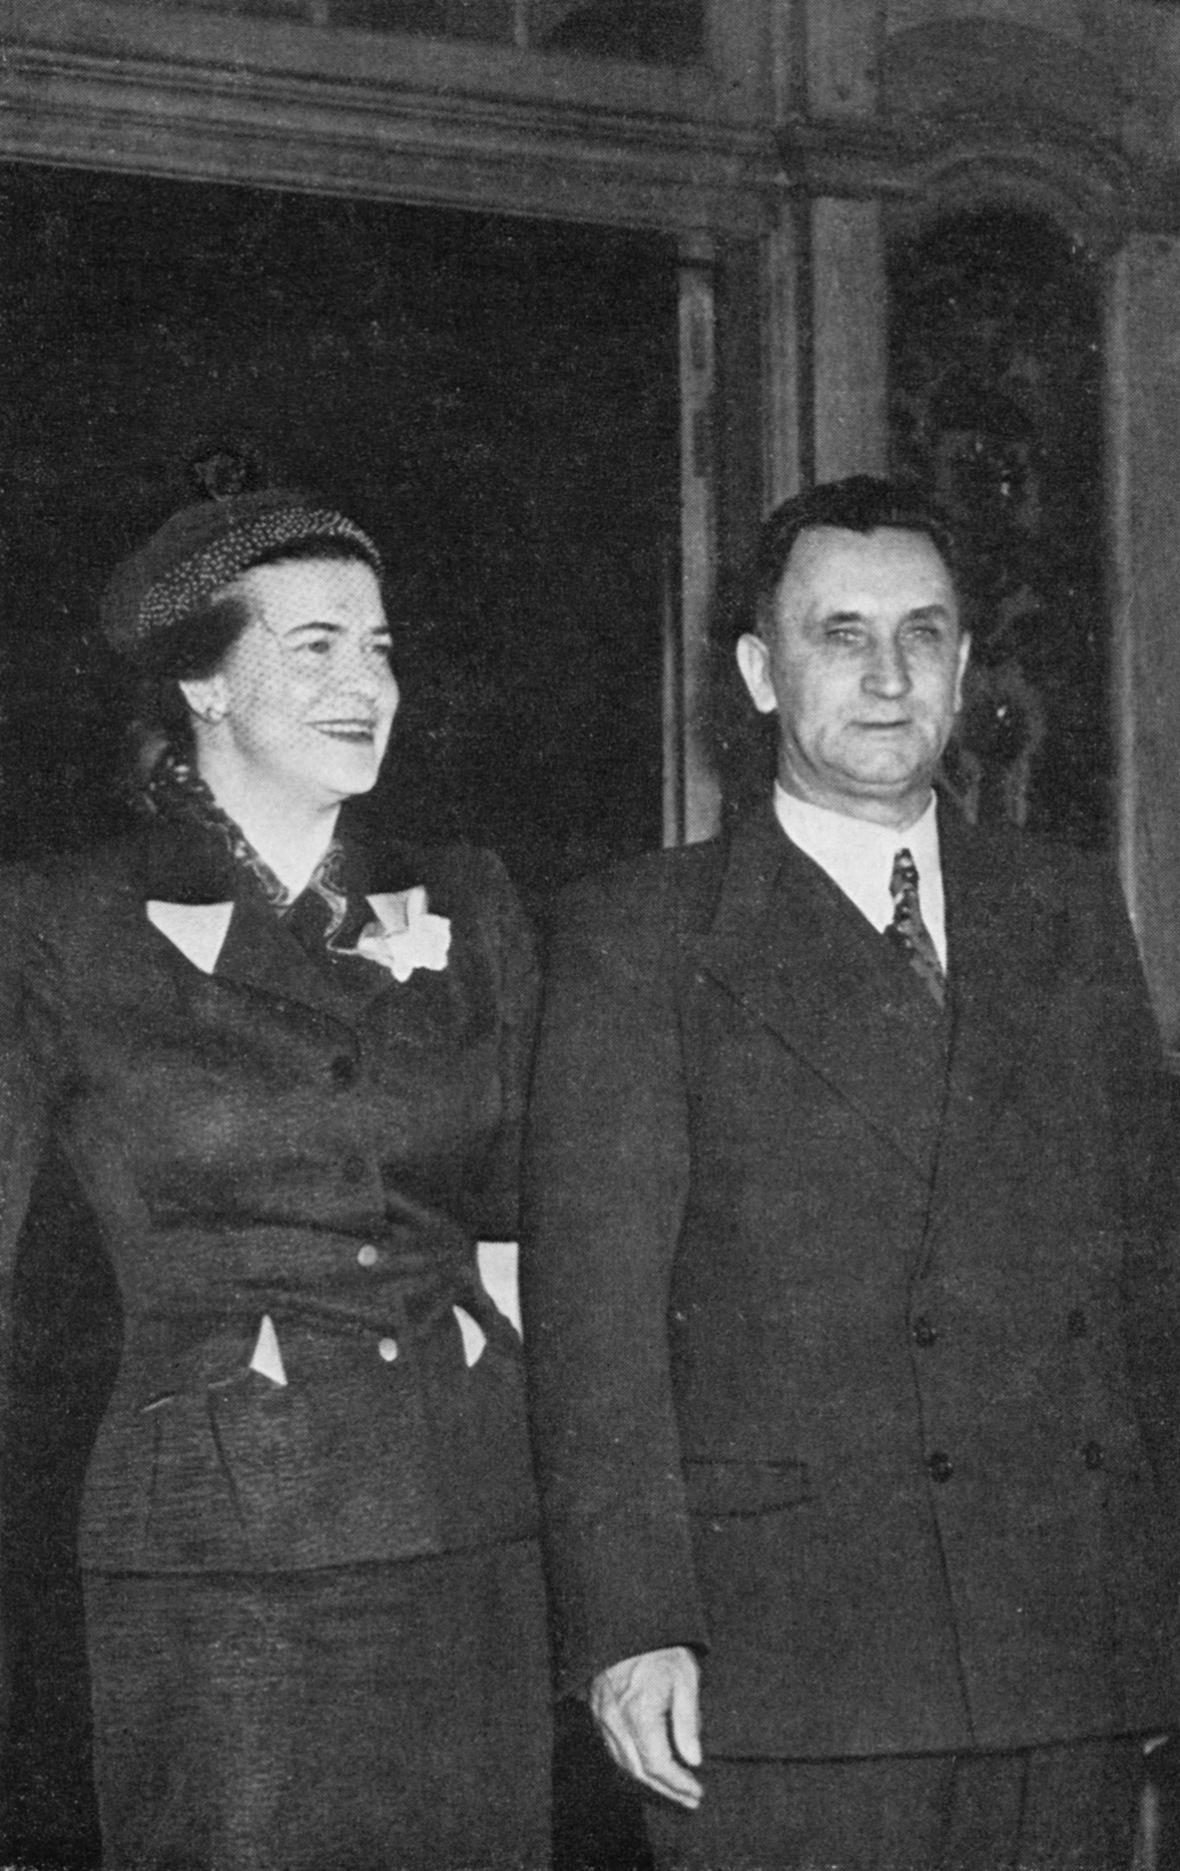 Adv_JG_en_mev_Susan_JG_Strijdom_voor_Groote_Schuur,_Desember_1954.jpg